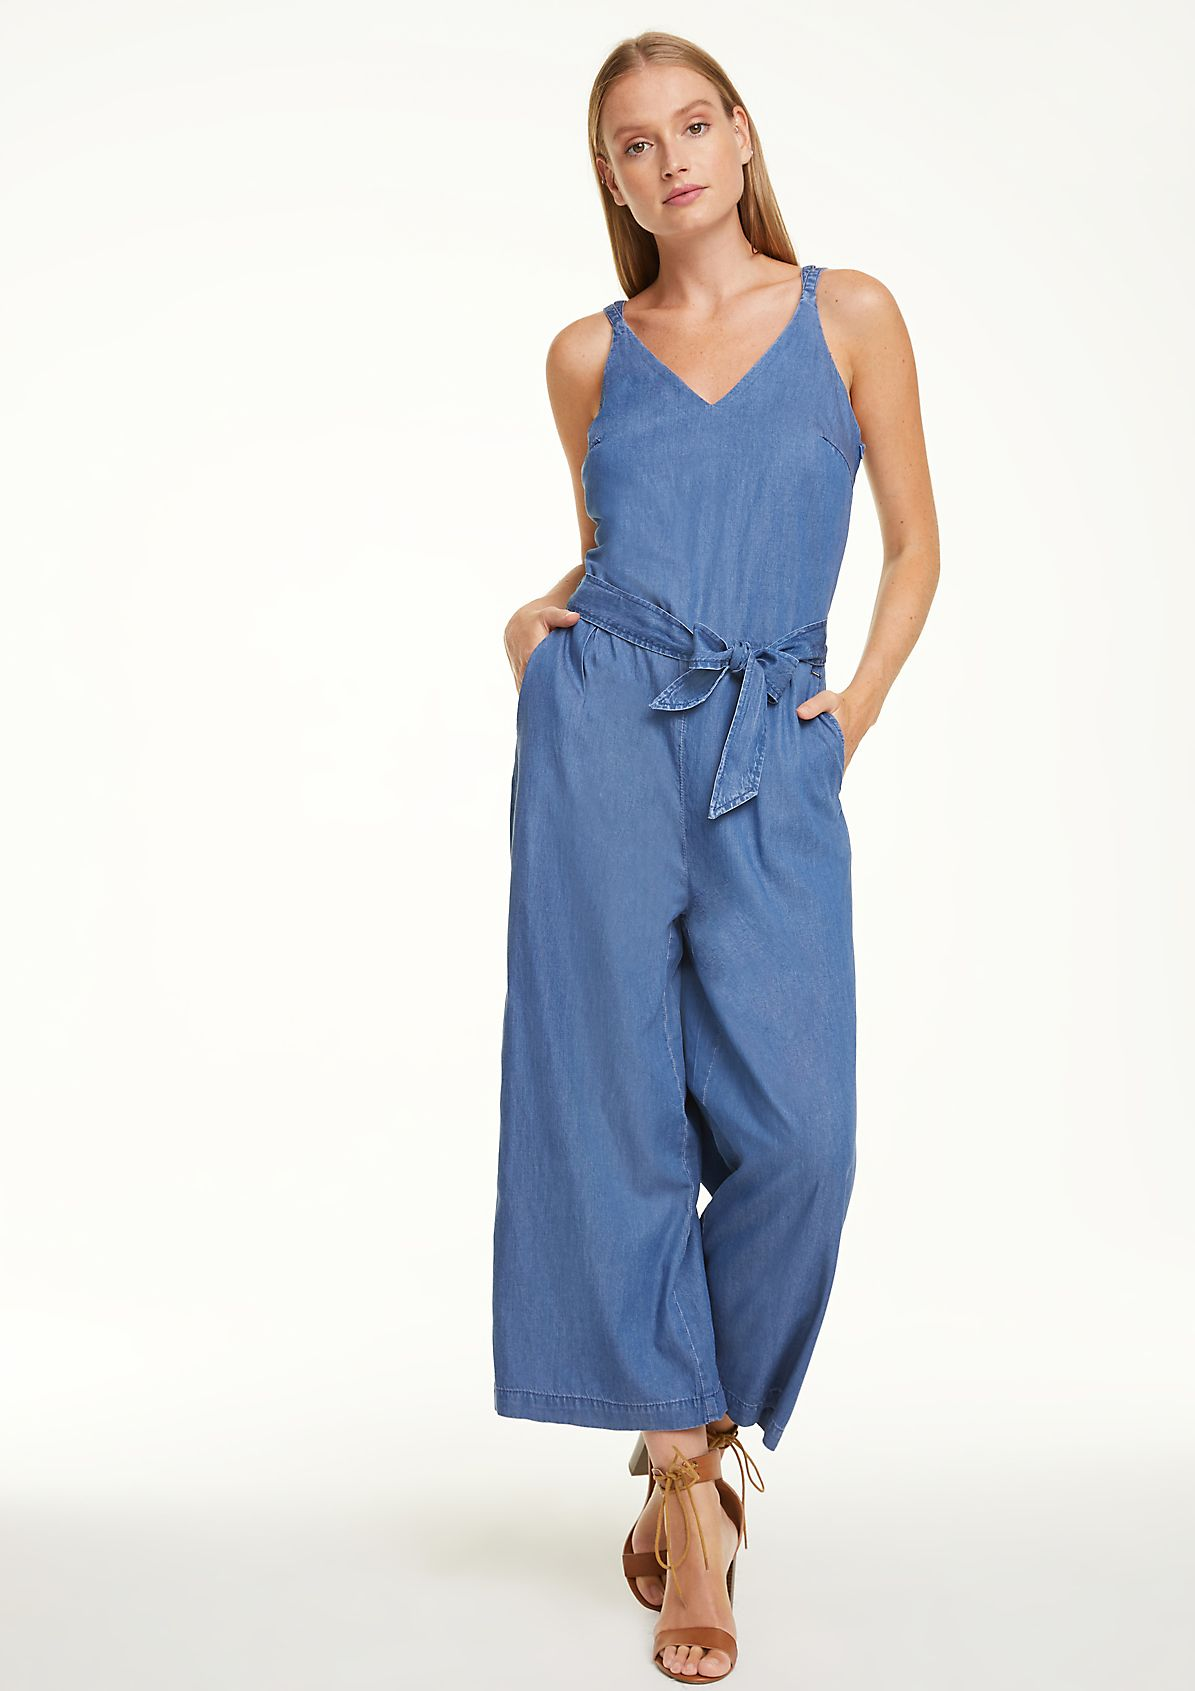 Denim Playsuit with Wrap Skirt Size LXL